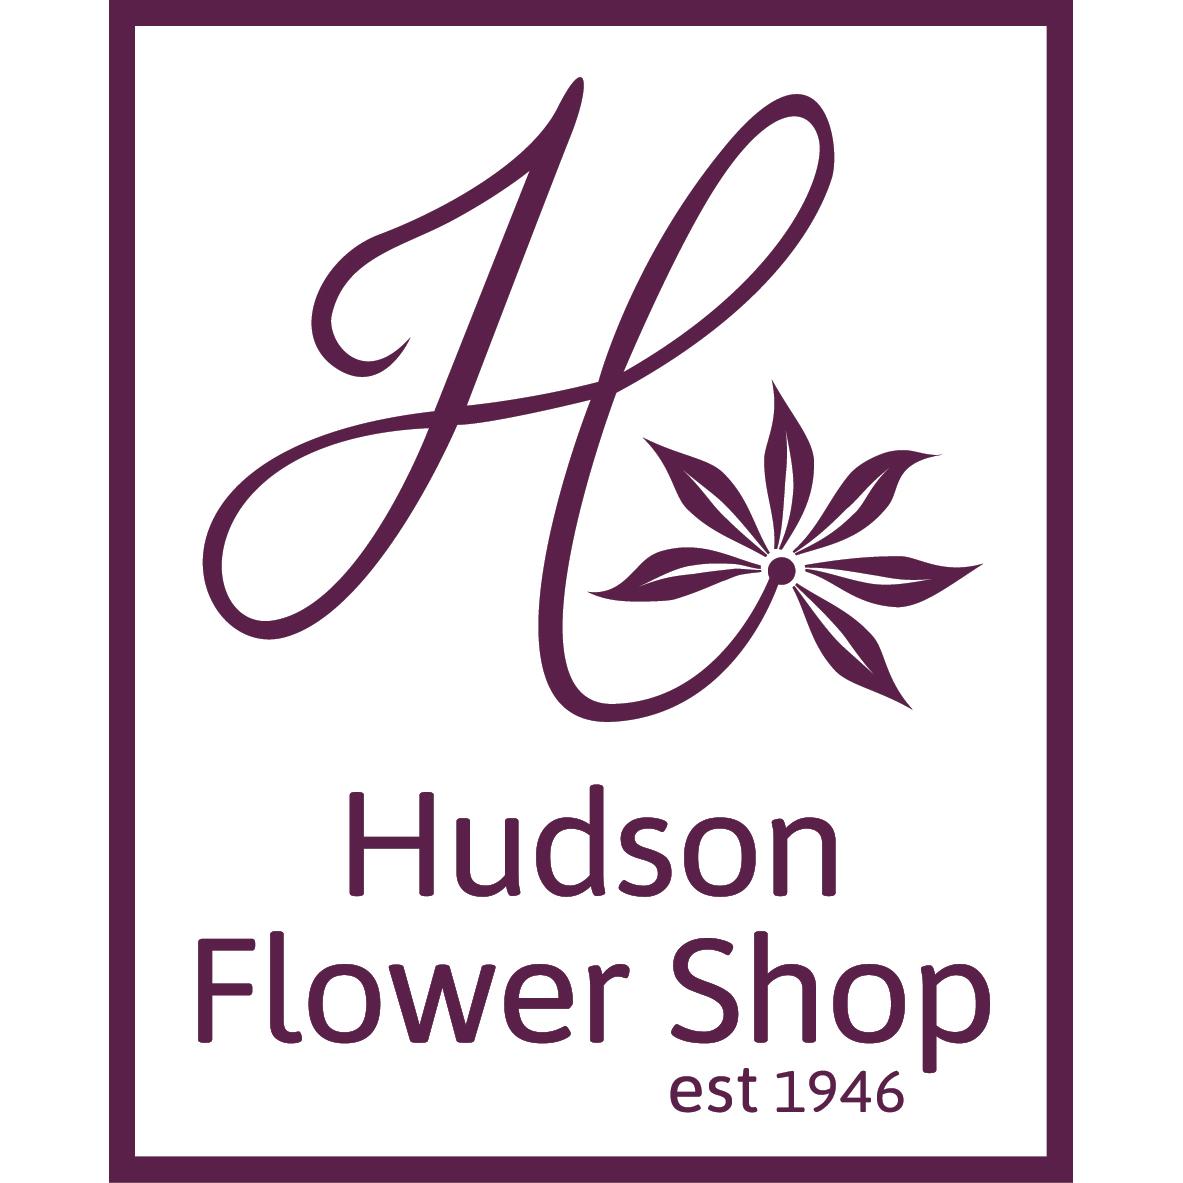 Hudson Flower Shop Coupons near me in Hudson